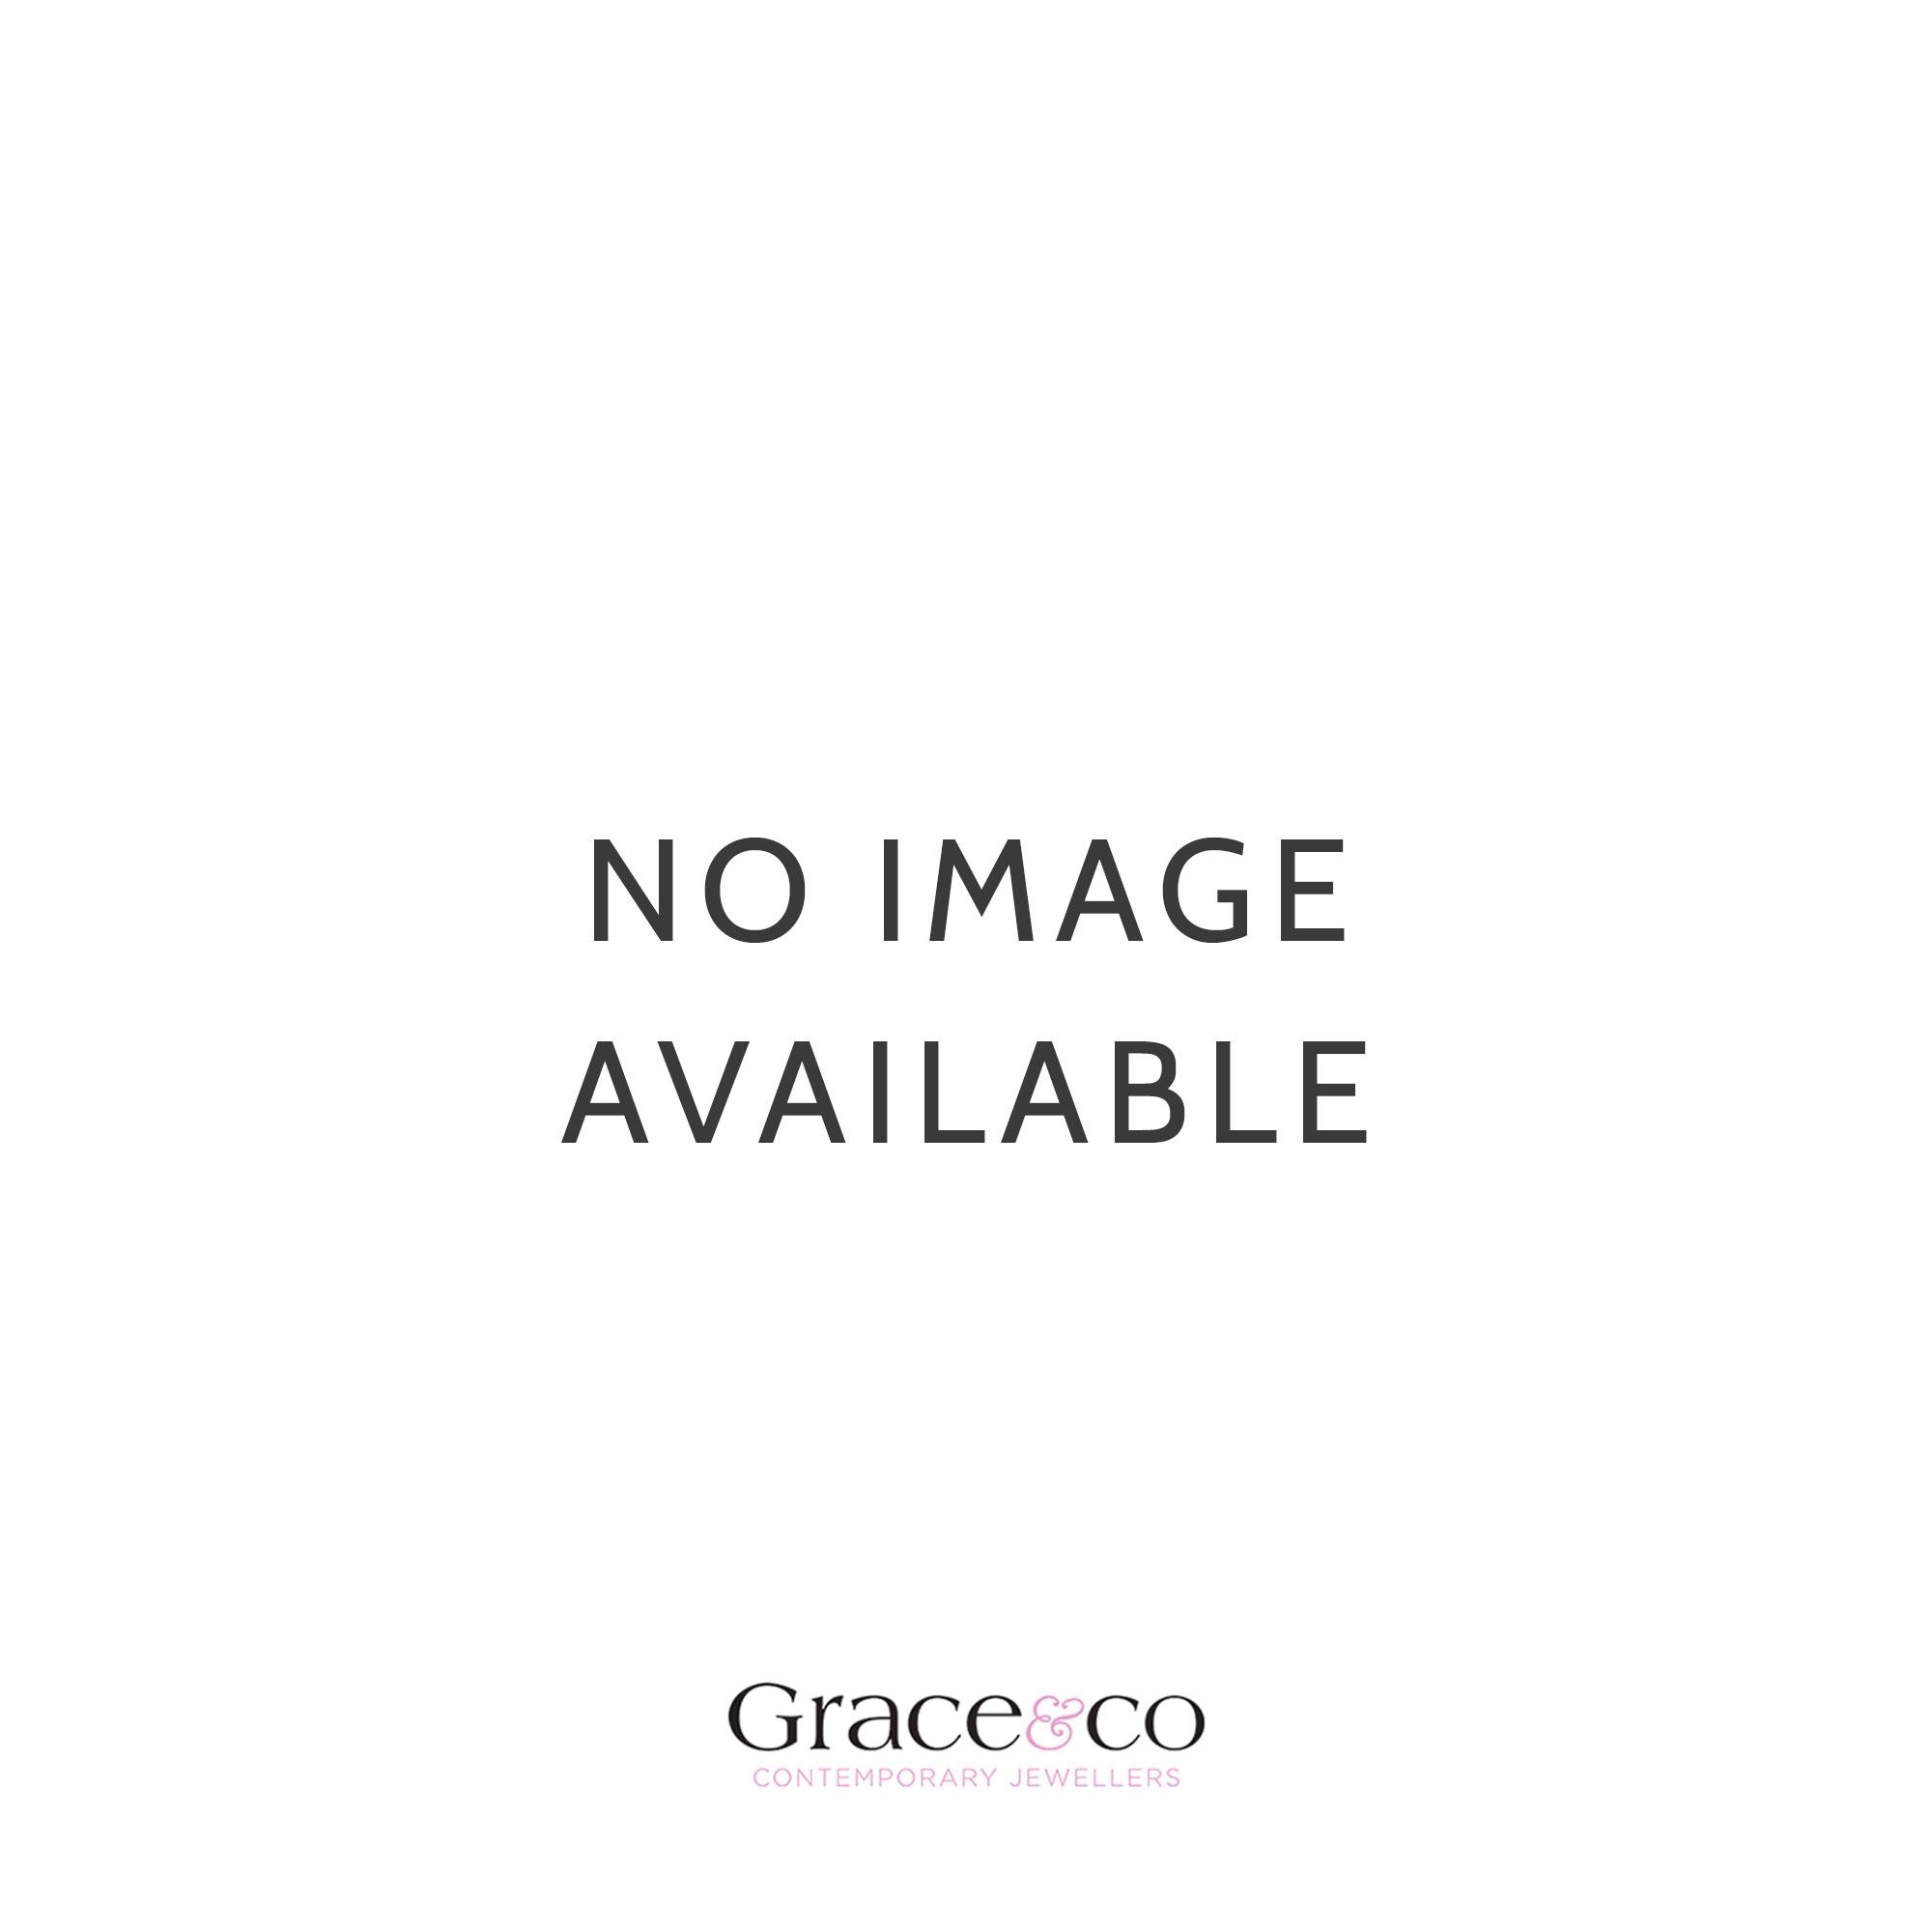 fbfe2d9c683e COEUR DE LION Light Peach Rhinestone Crystal Pave Earrings